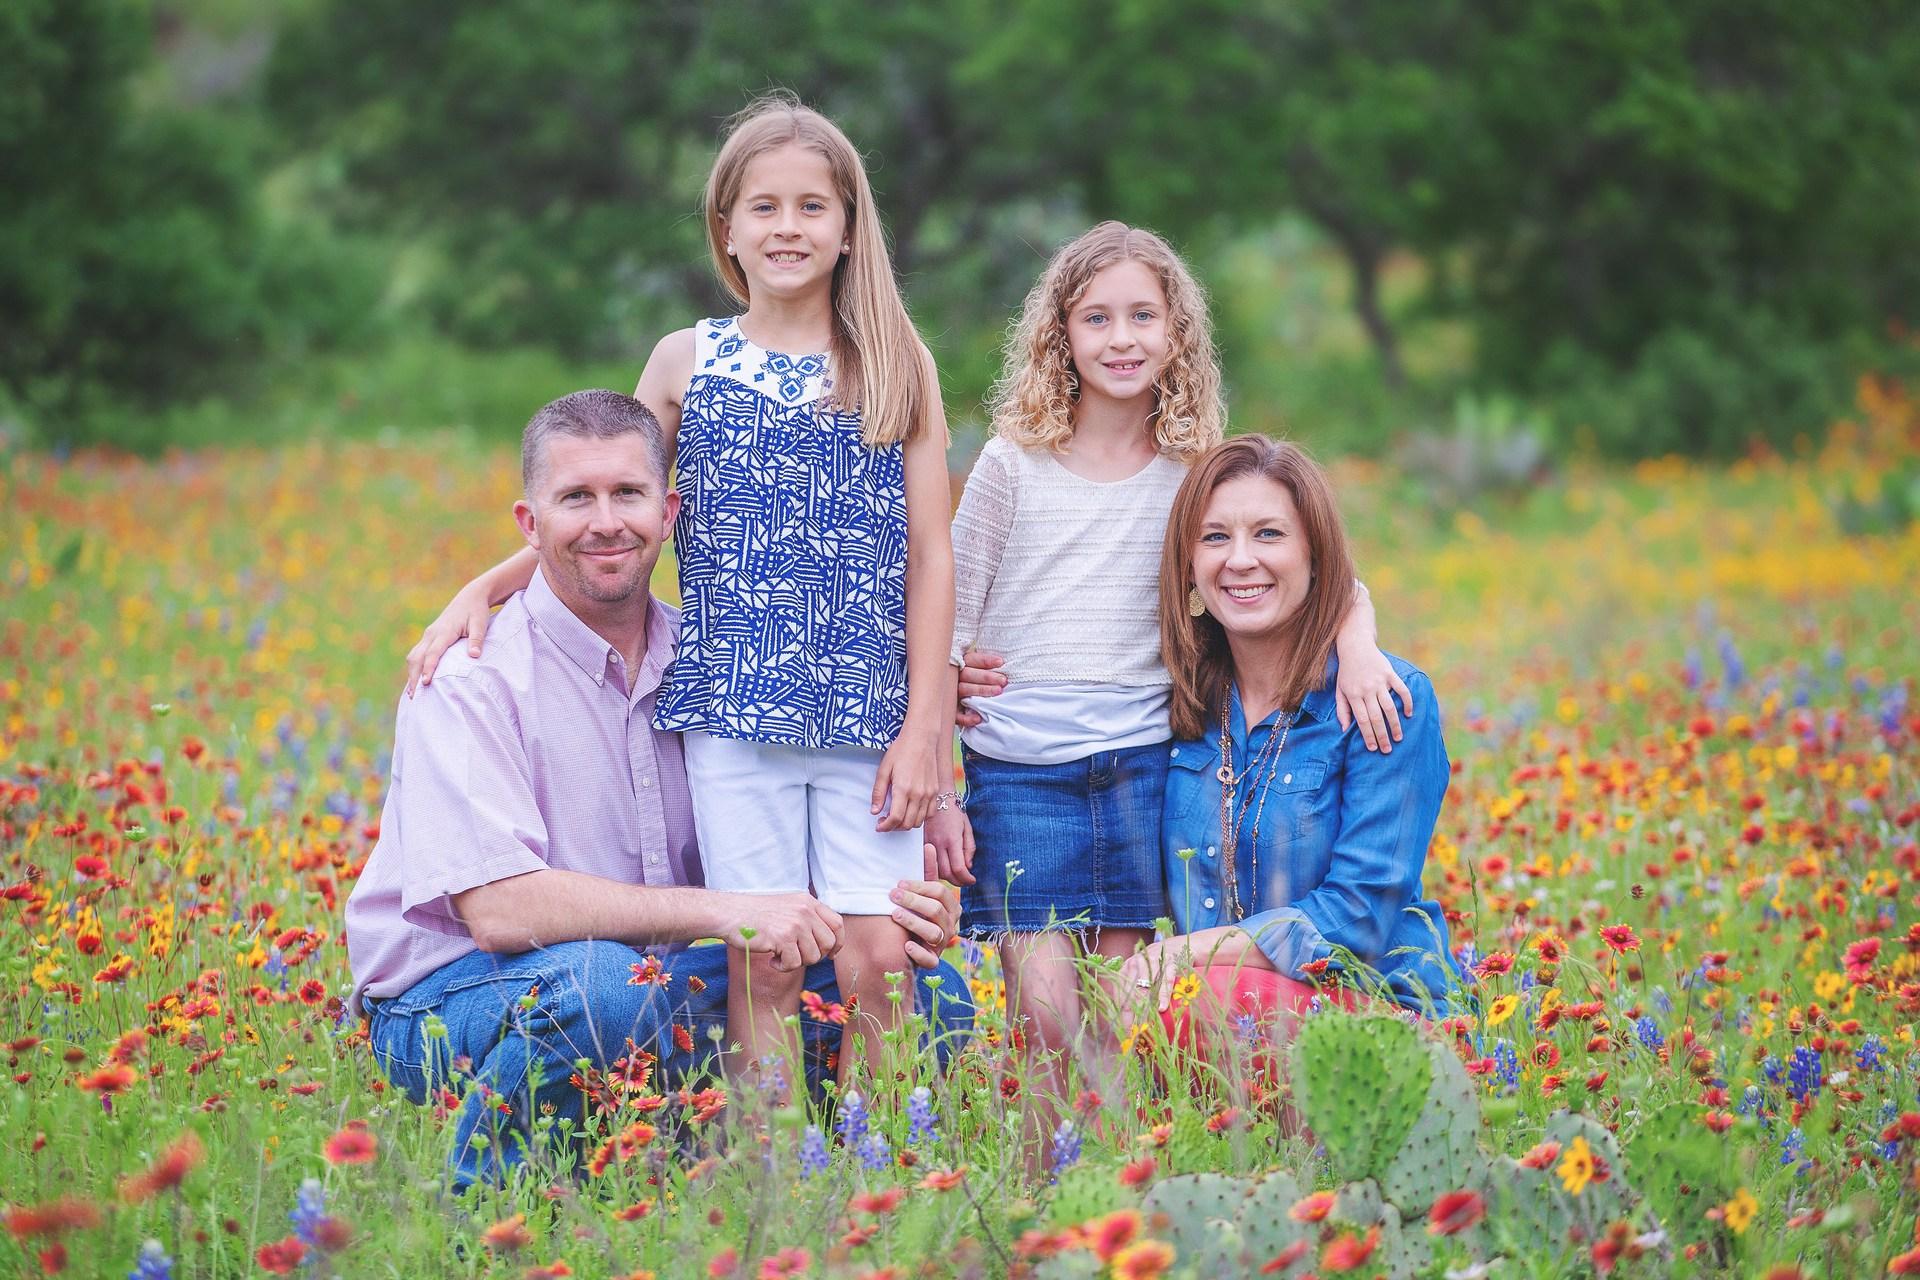 Burns Family Photo